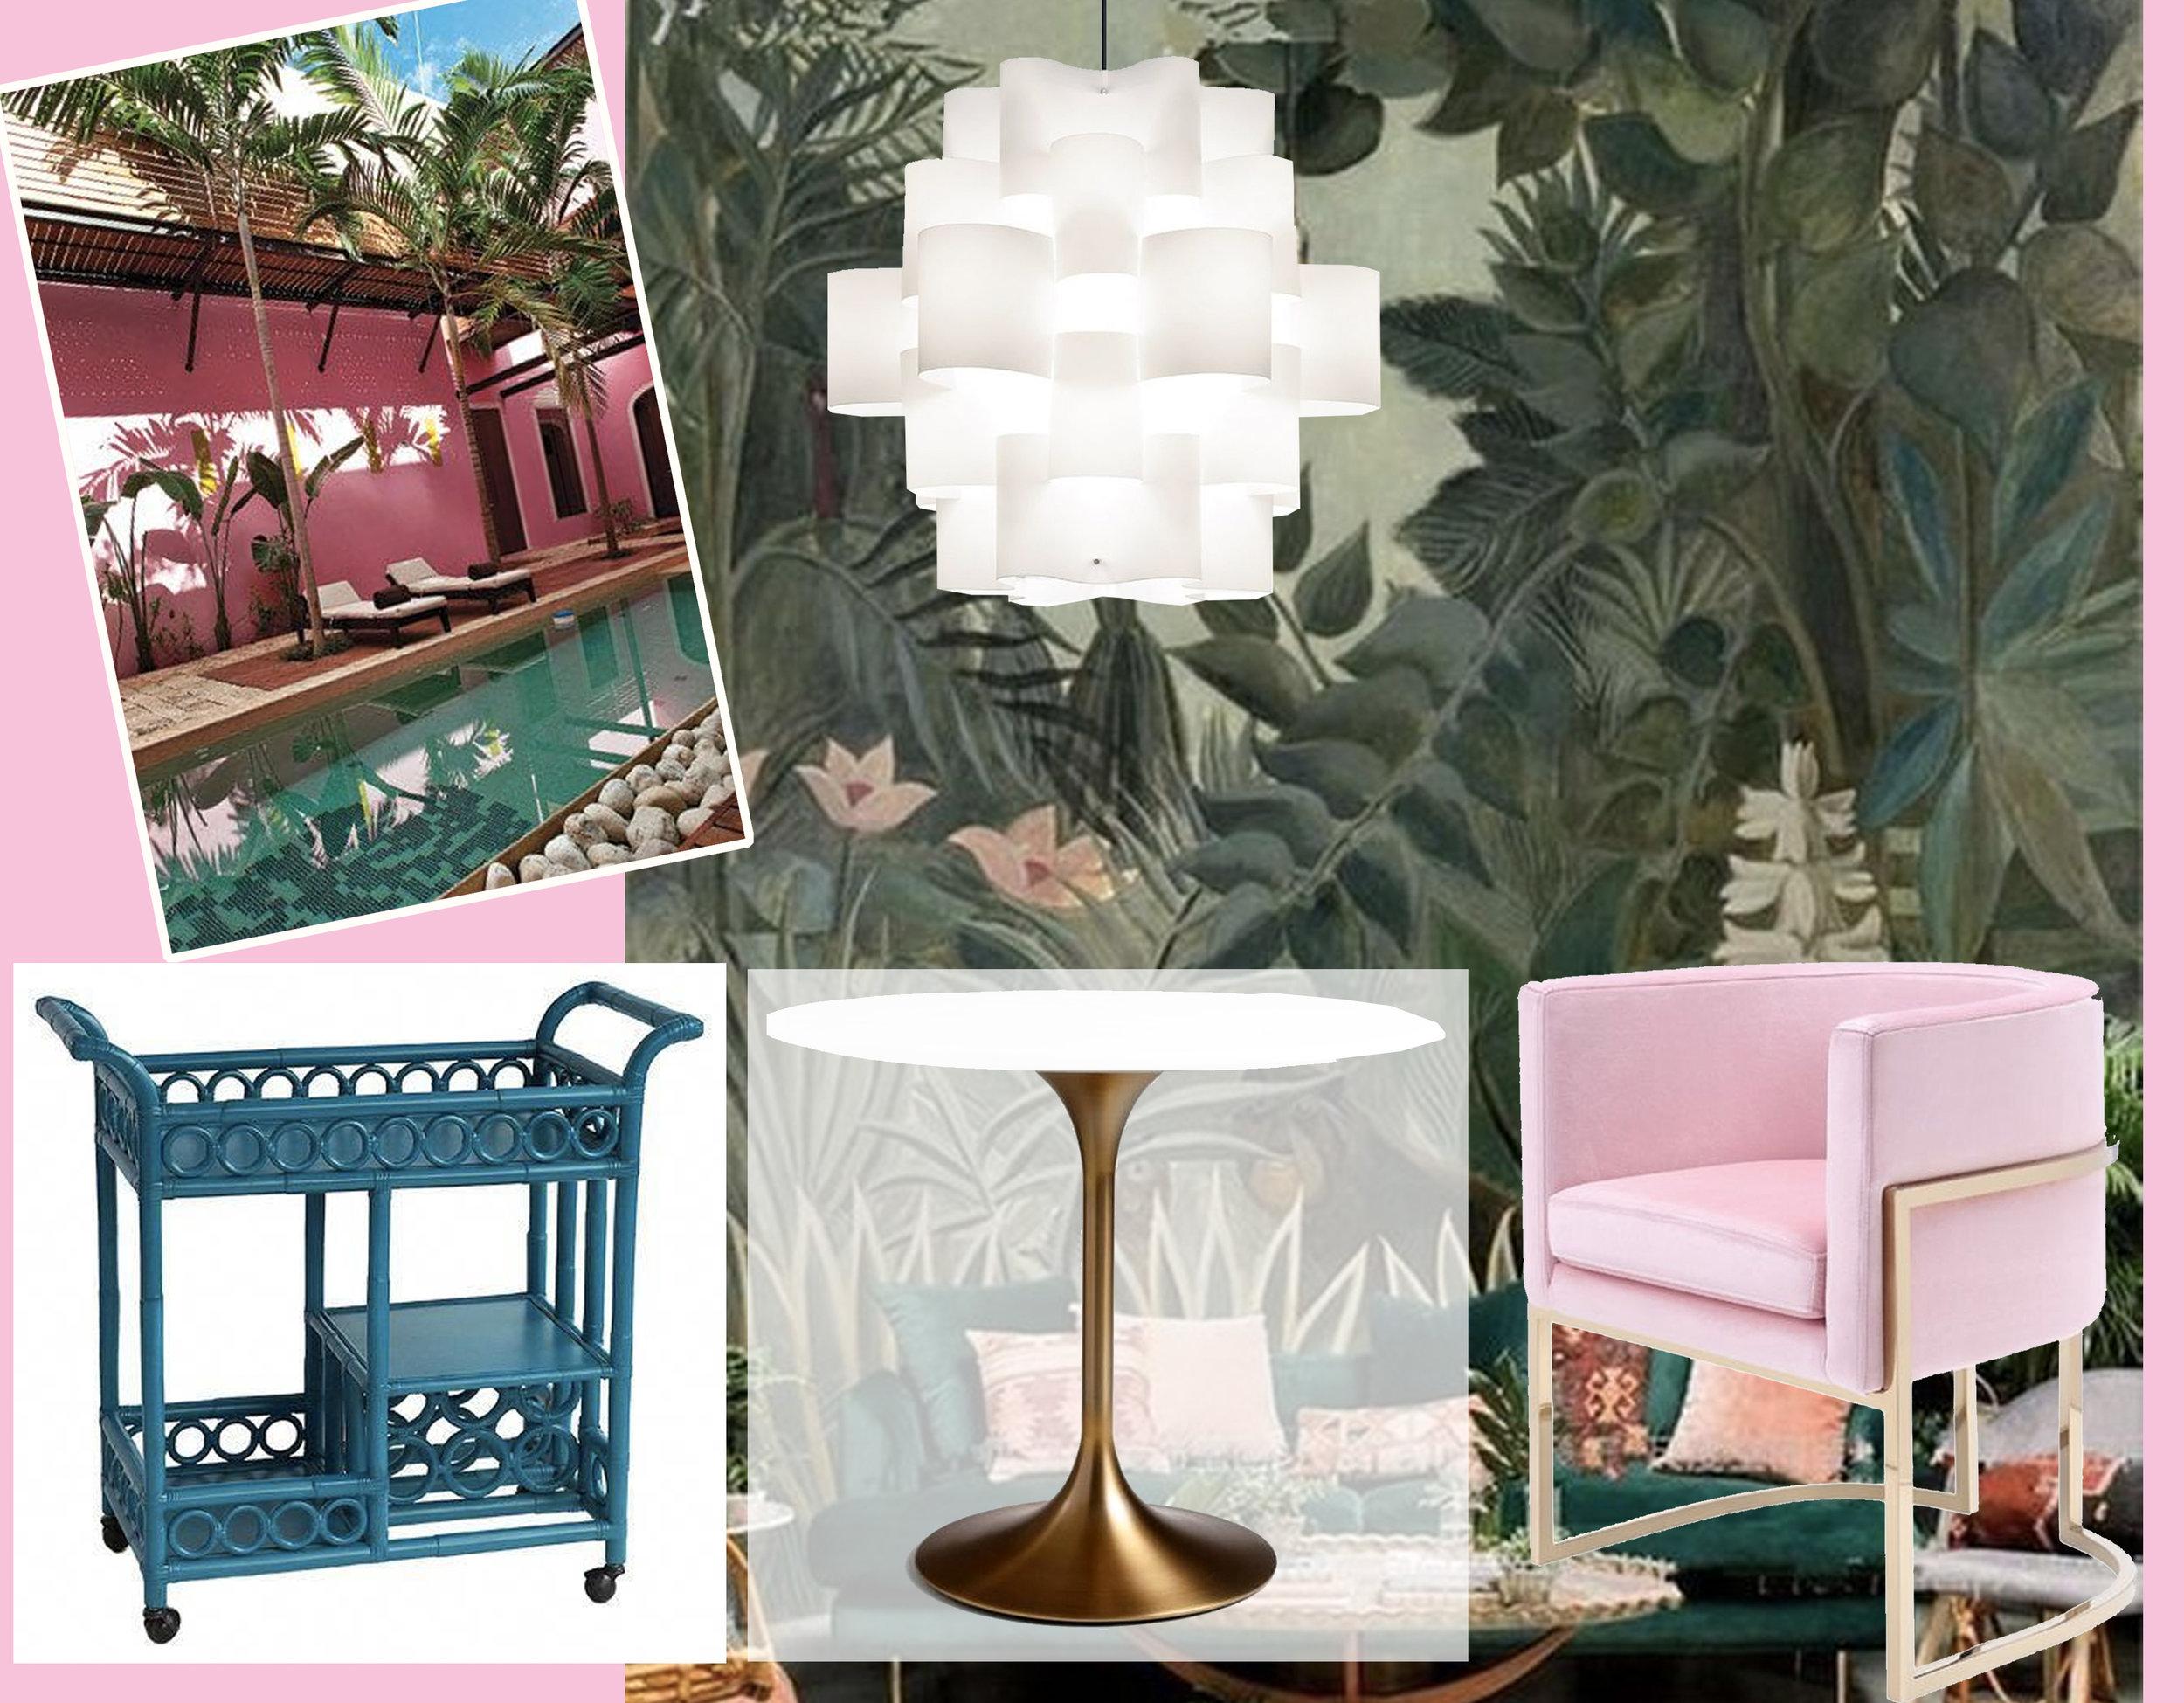 travel image via  Bridal Guide  - Jungle wallpaper via  Tapet Show  - Sun 50 suspended lamp via  Milia Shop  -bar cart  Bungalow & Cottage  - Betsy pink dining chair  Stylish Furniture